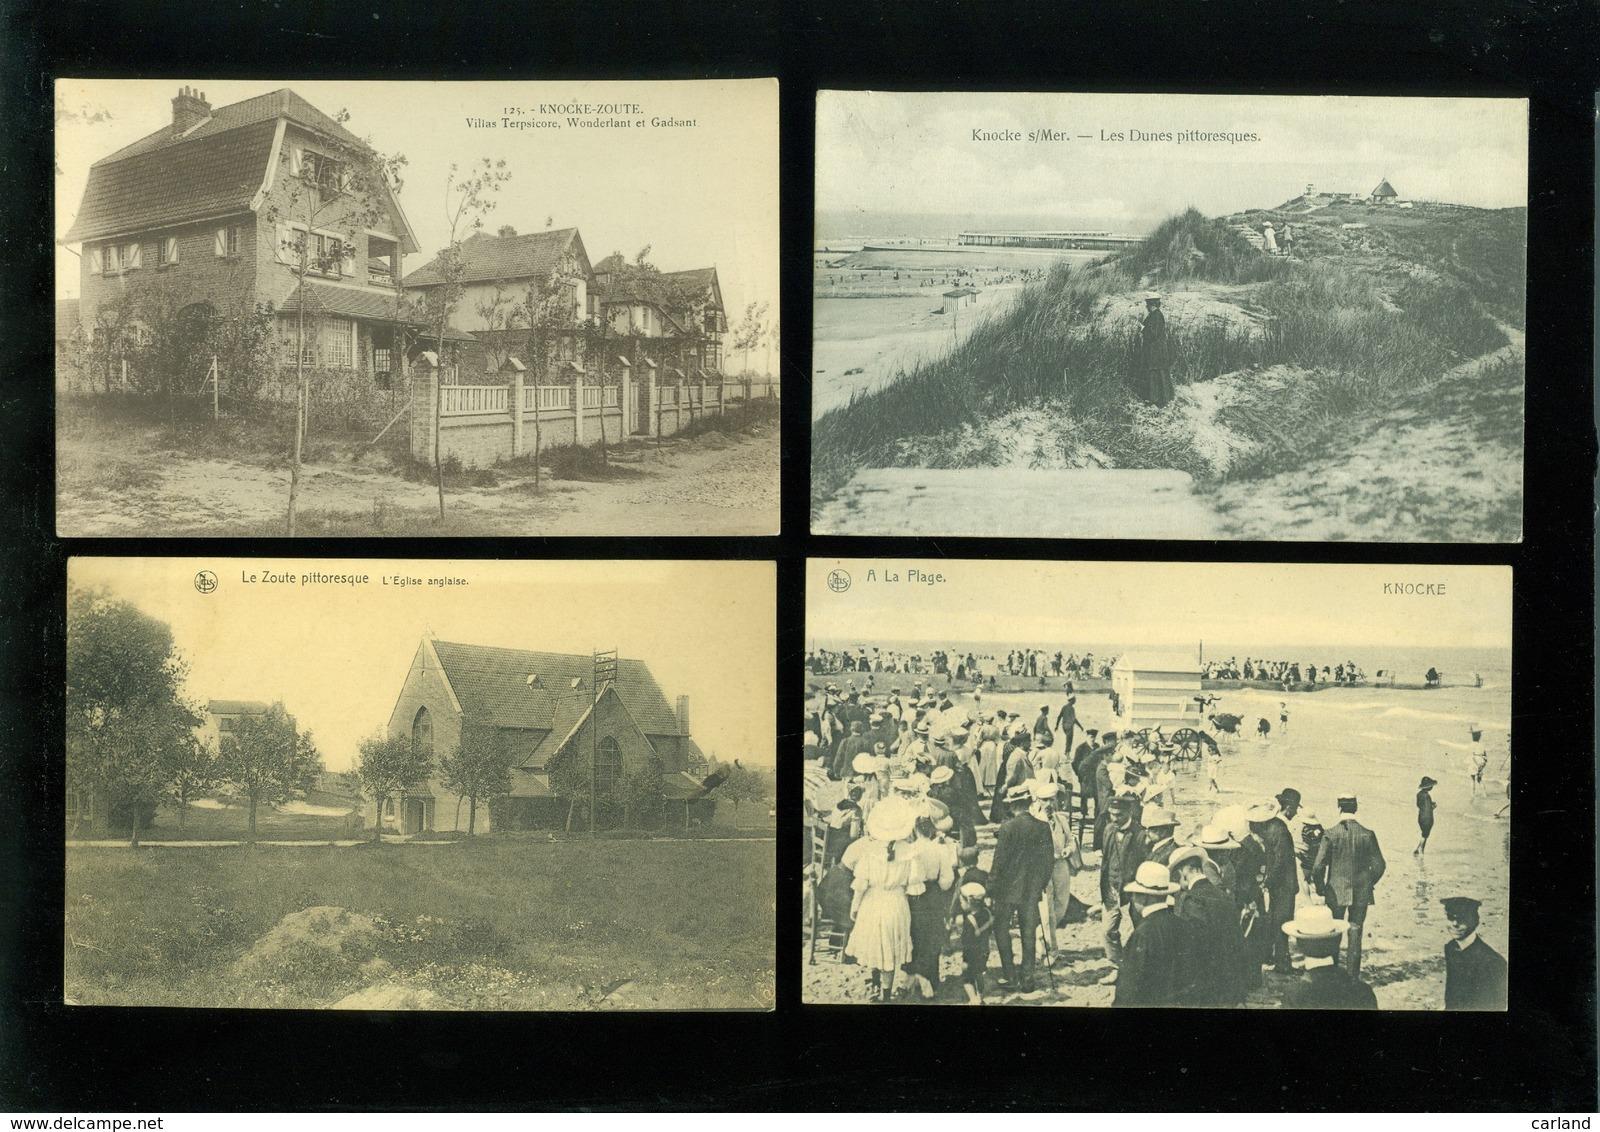 Beau Lot De 20 Cartes Postales De Belgique  Knocke  Mooi Lot Van 20 Postkaarten Van Knokke - 20 Scans - Cartes Postales